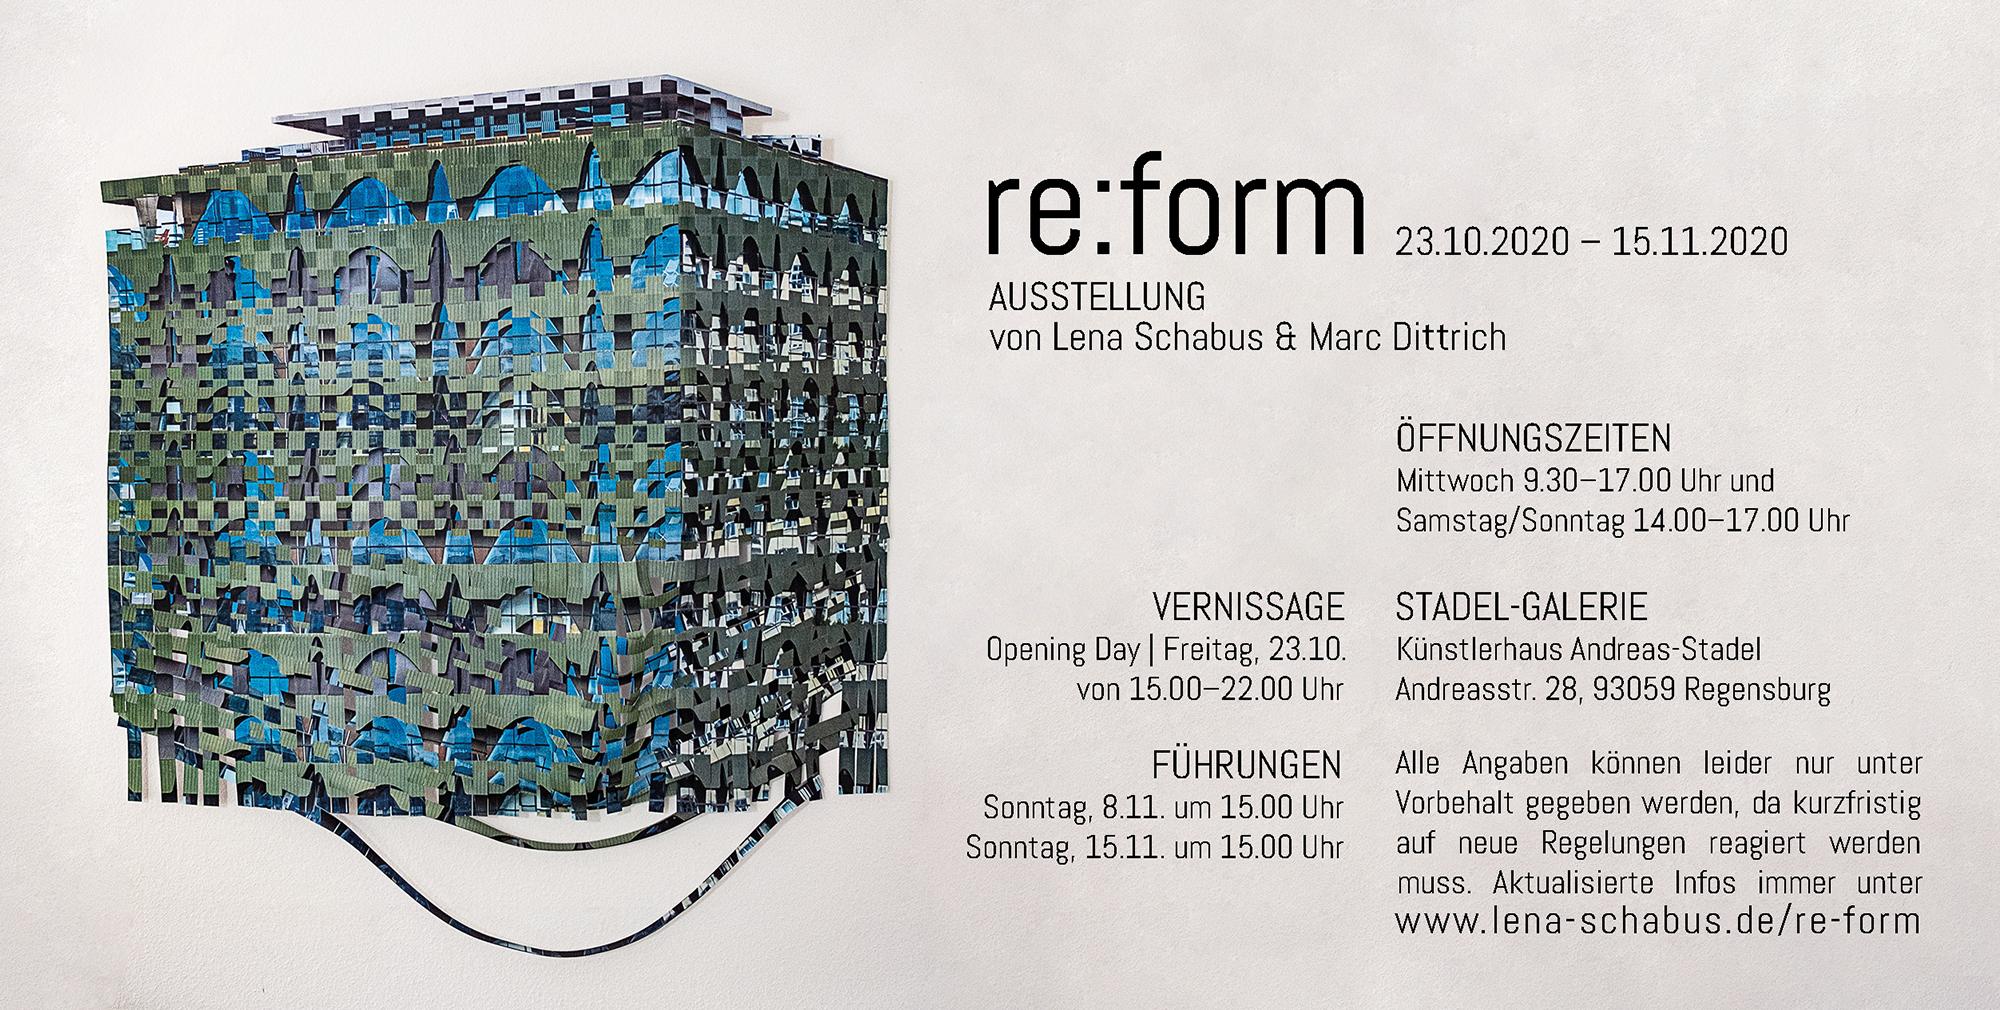 Ausstellung re:form